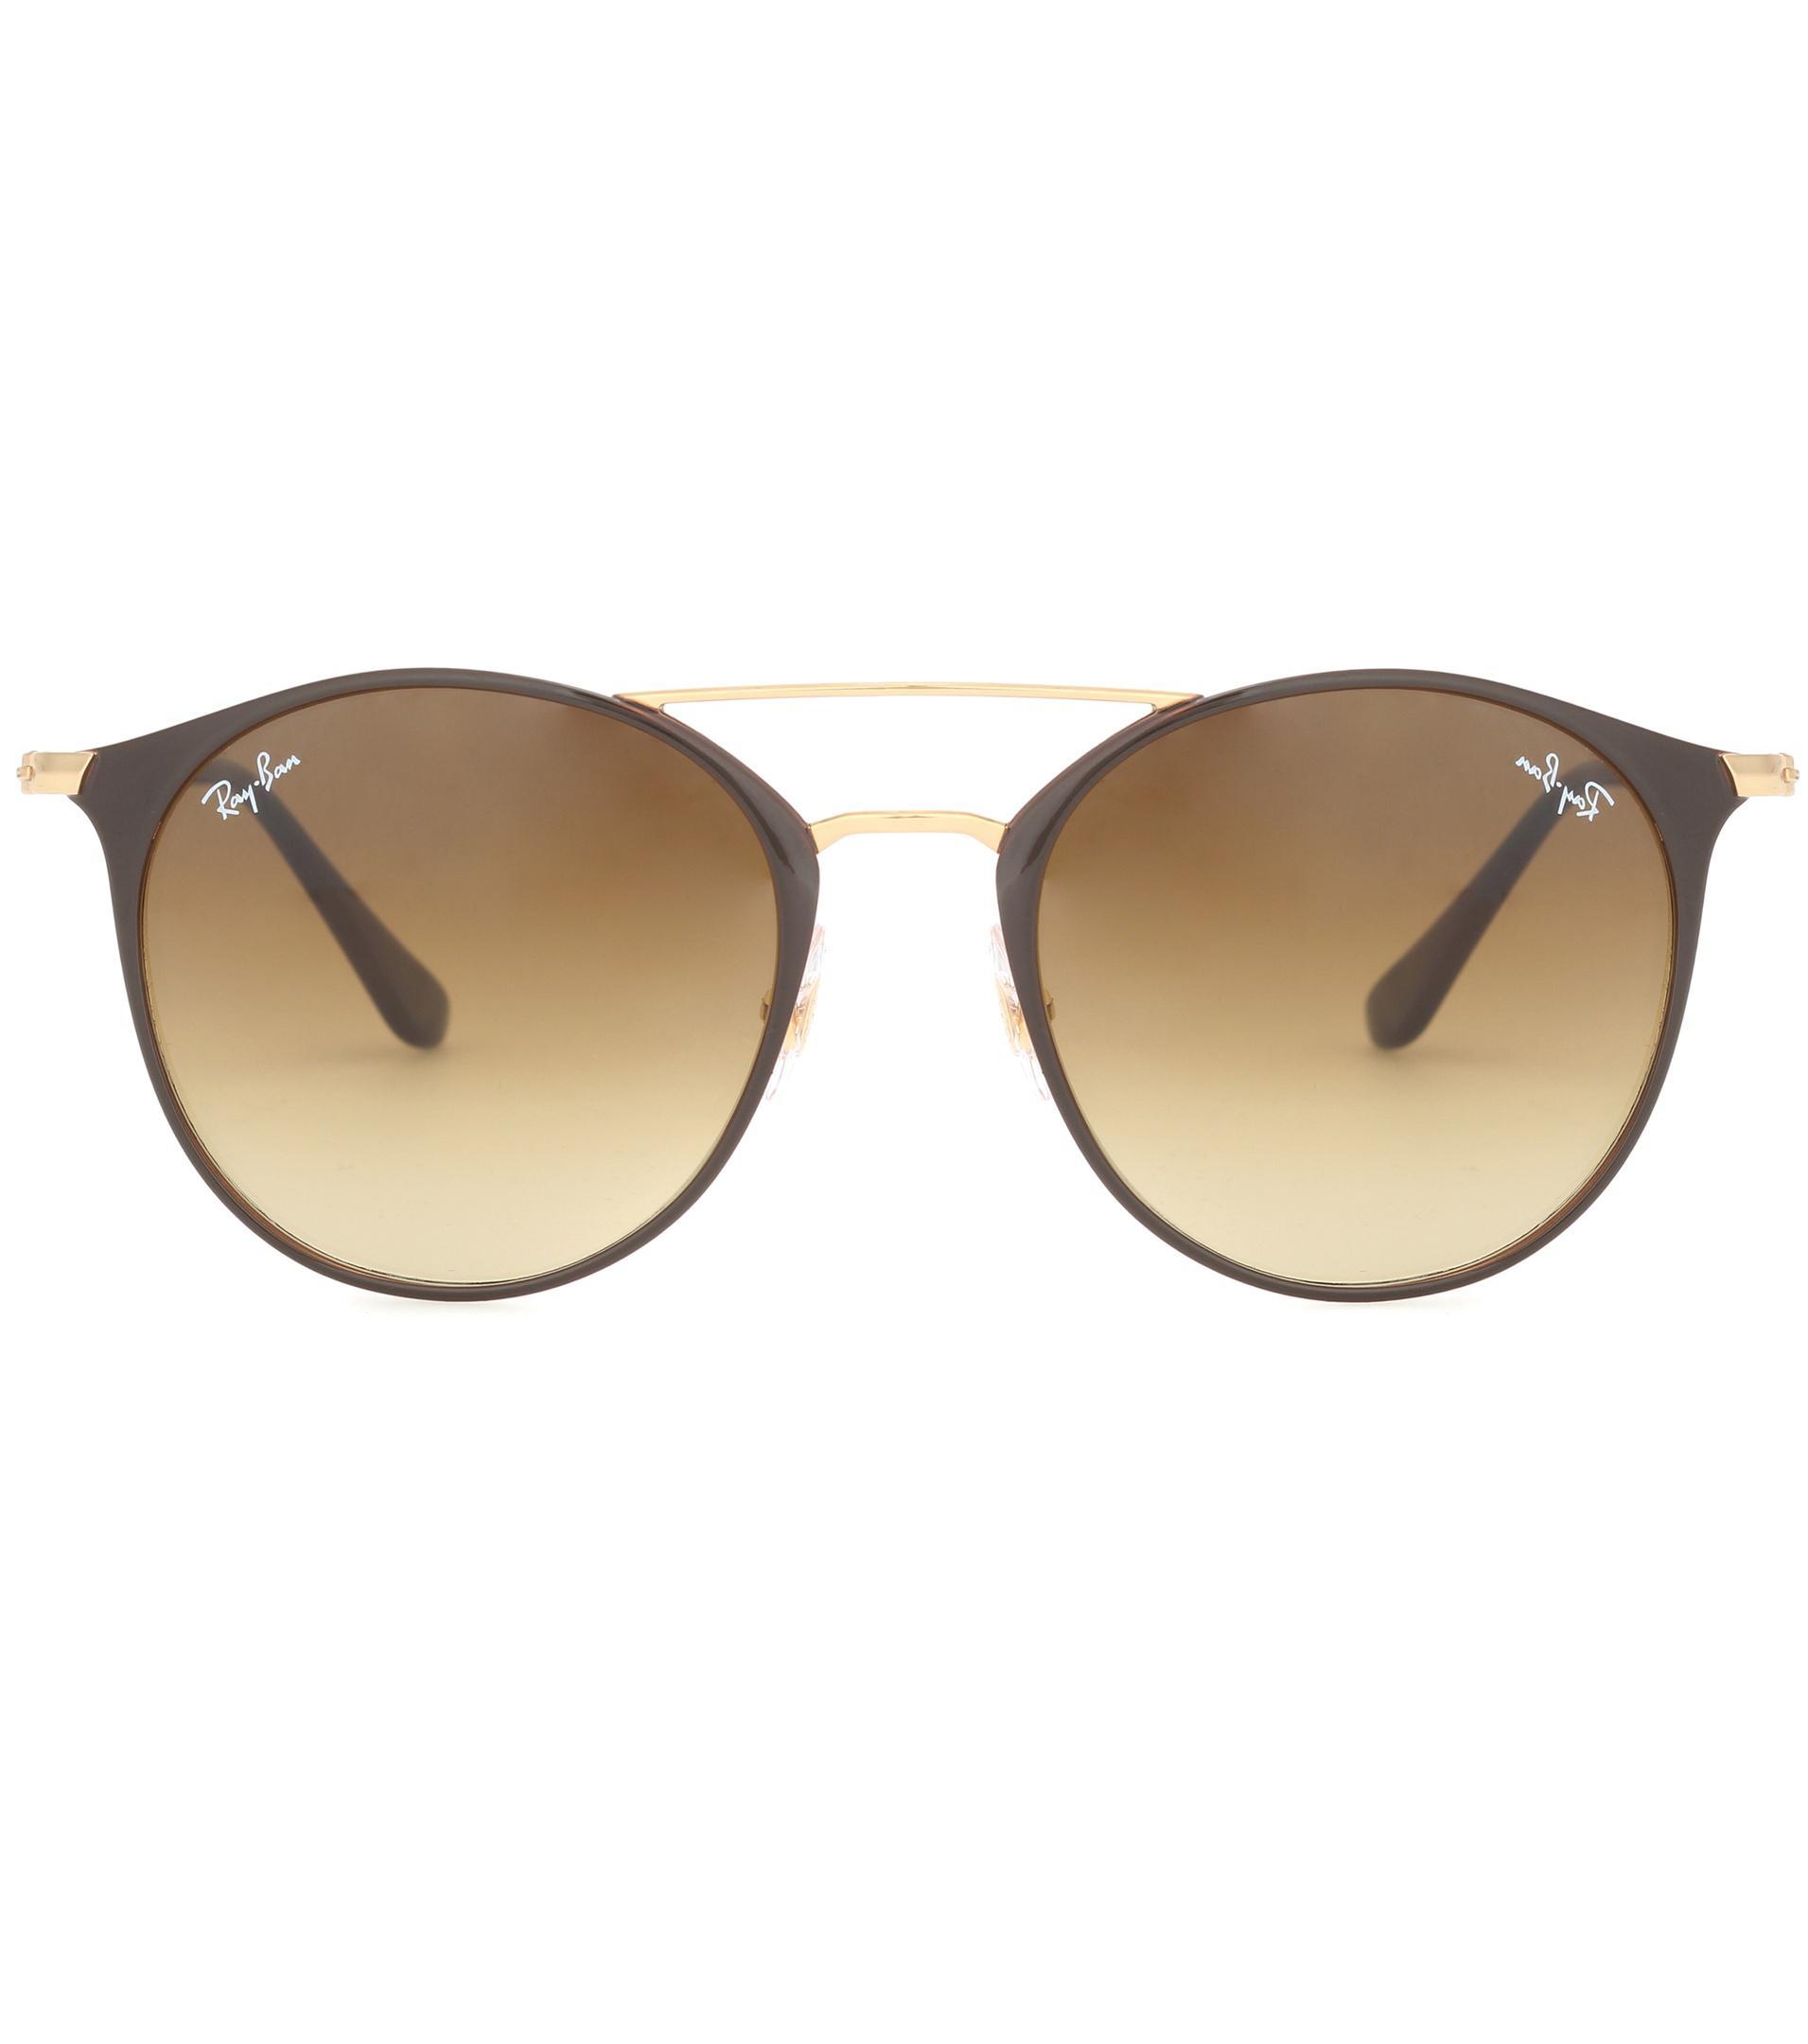 Ray-Ban RB3546 round sunglasses bRgxZBc